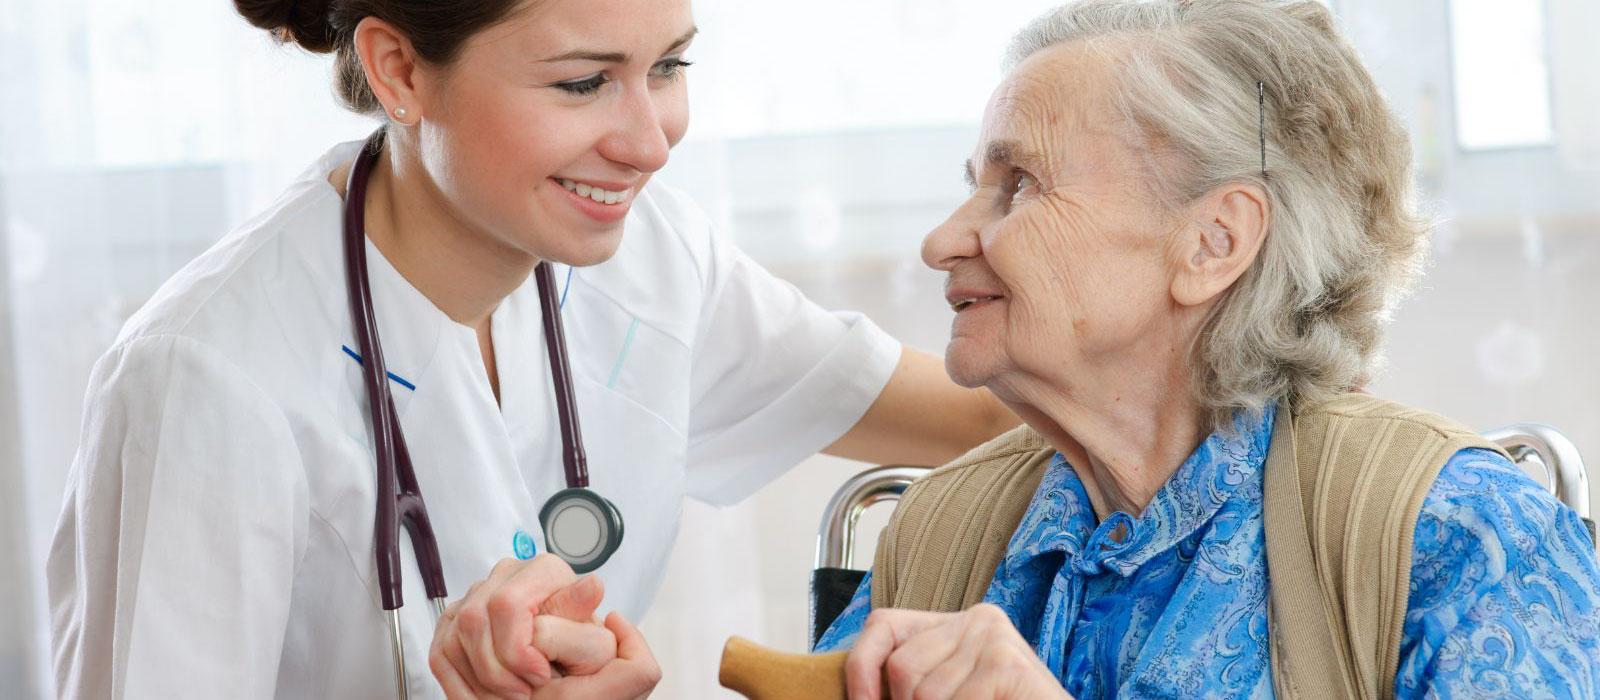 http://parastari24.ir/به پرستاری ۲۴ خوش آمدید- معرفی پرستار کودک و پرستار سالمند و بیمار در منزل